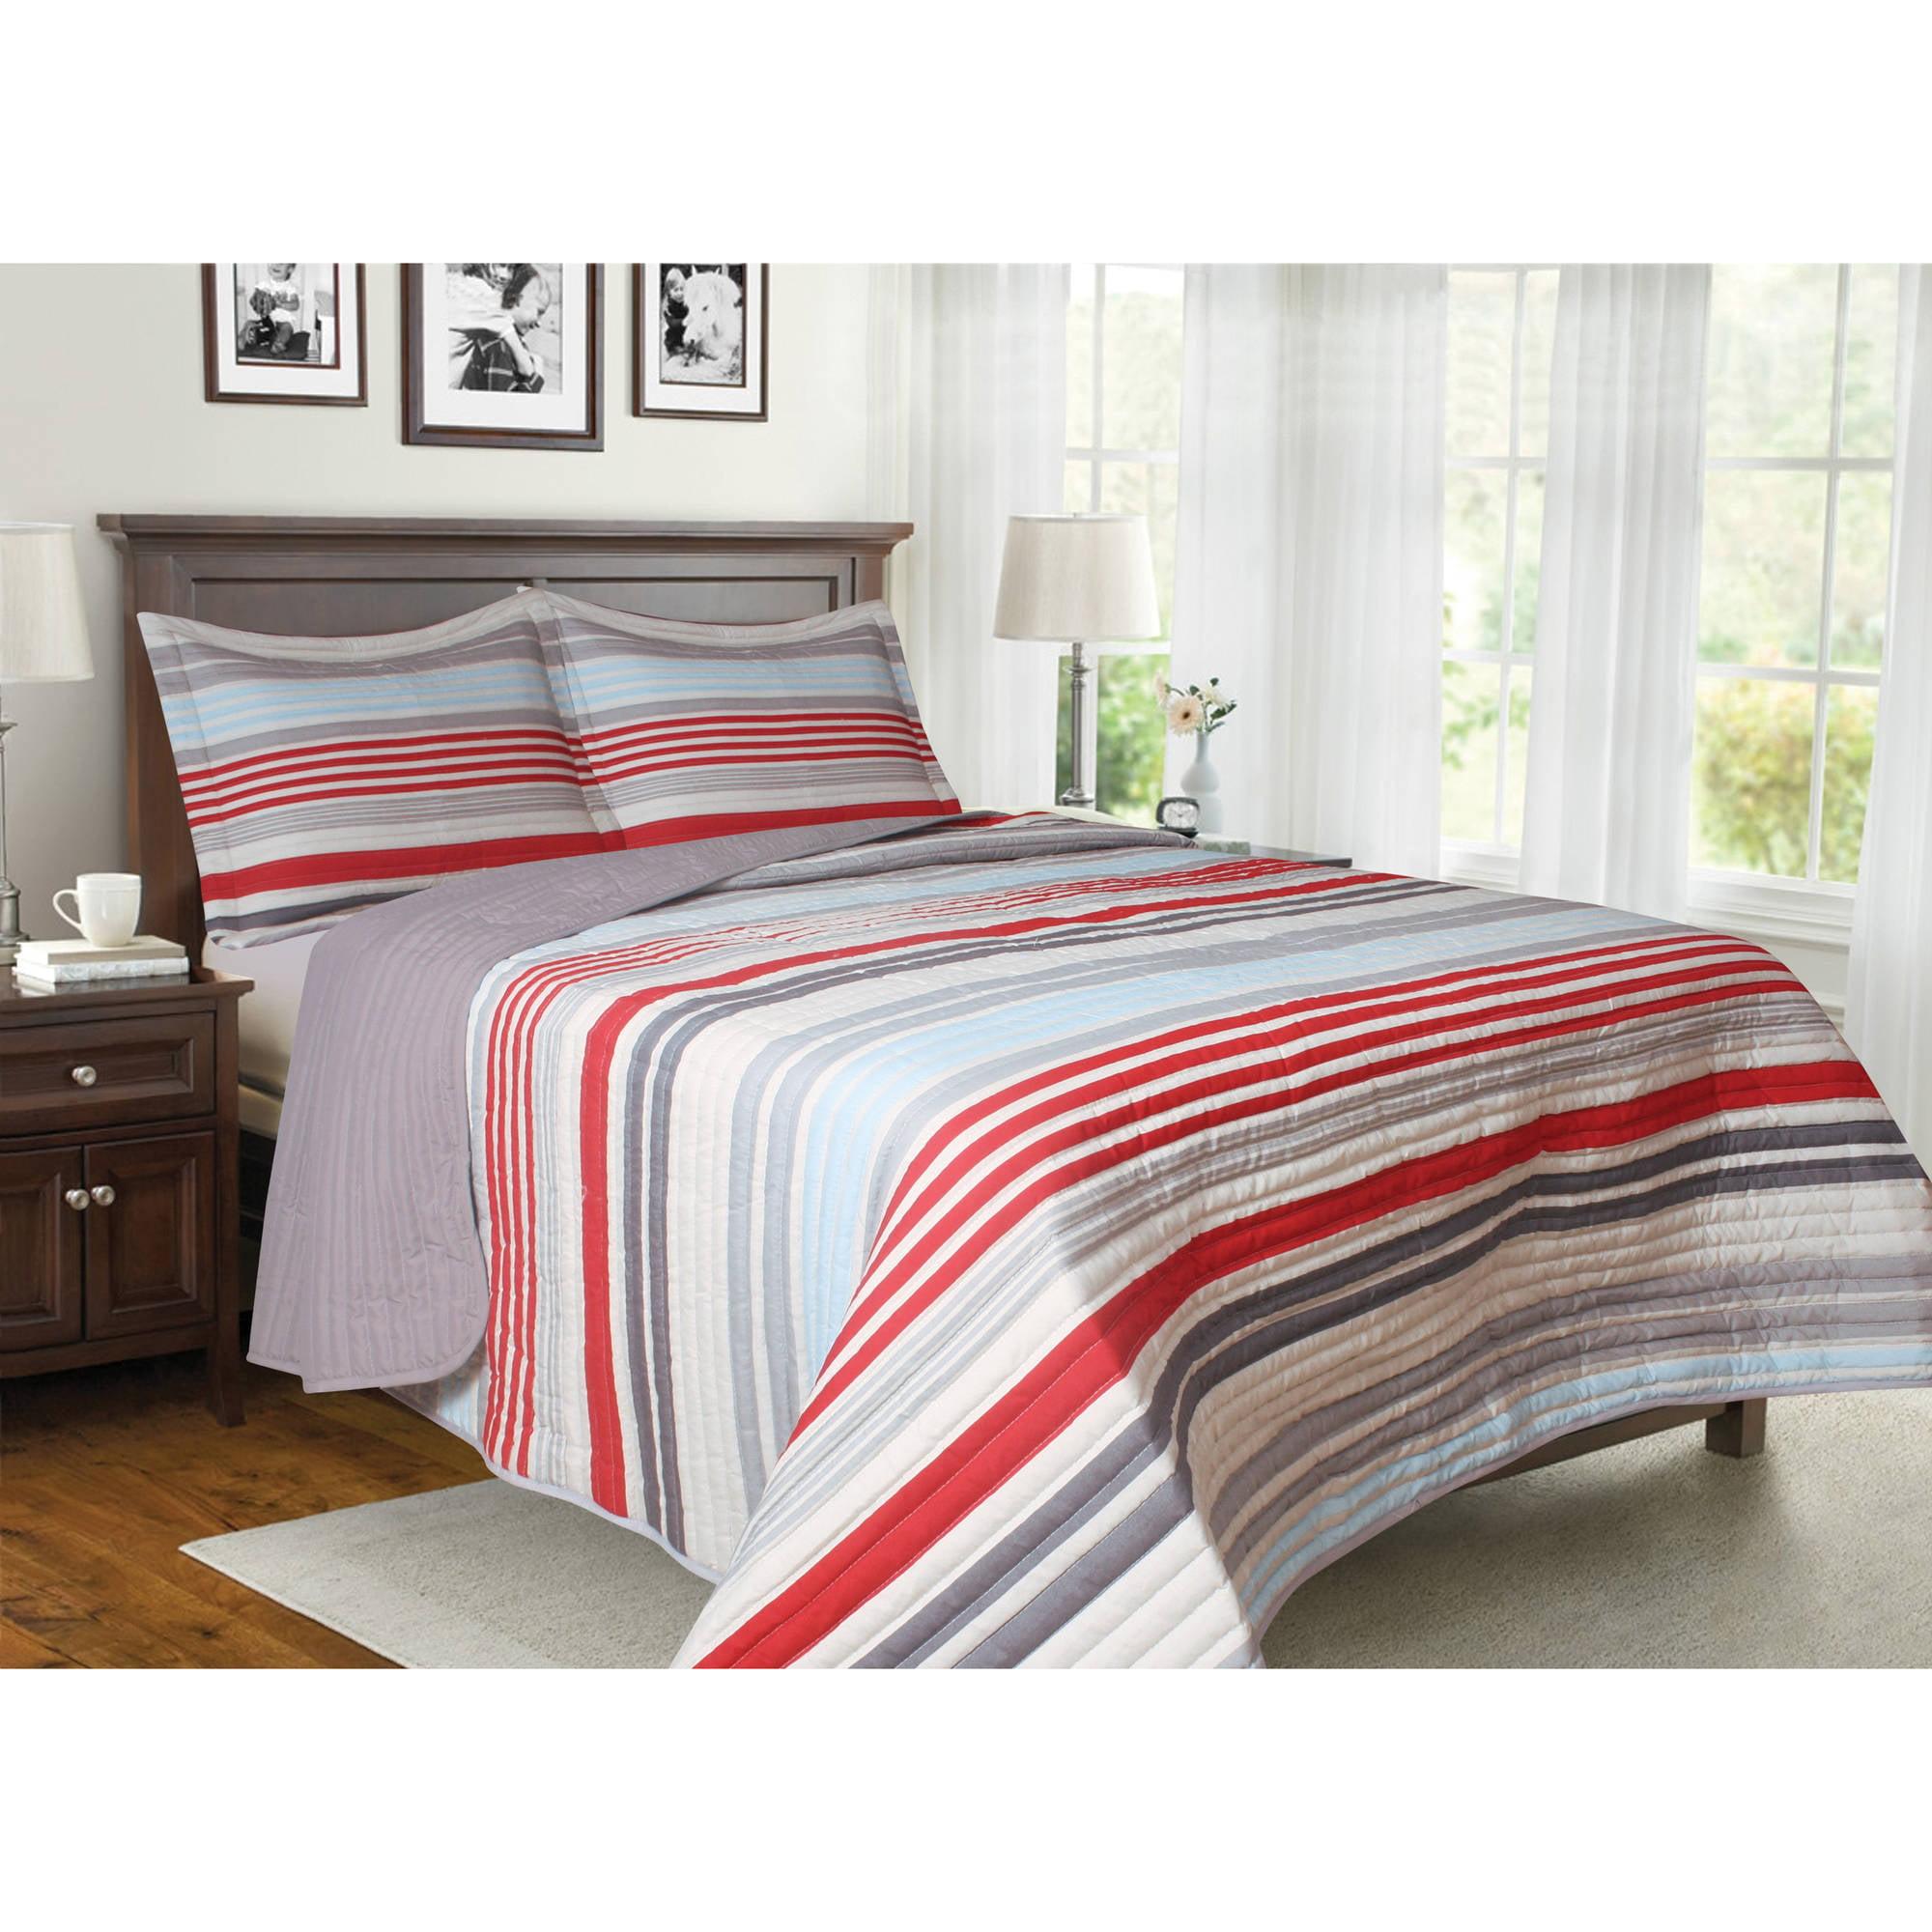 Generic Solaris Soft and Cozy Microfiber Bedding Quilt Set